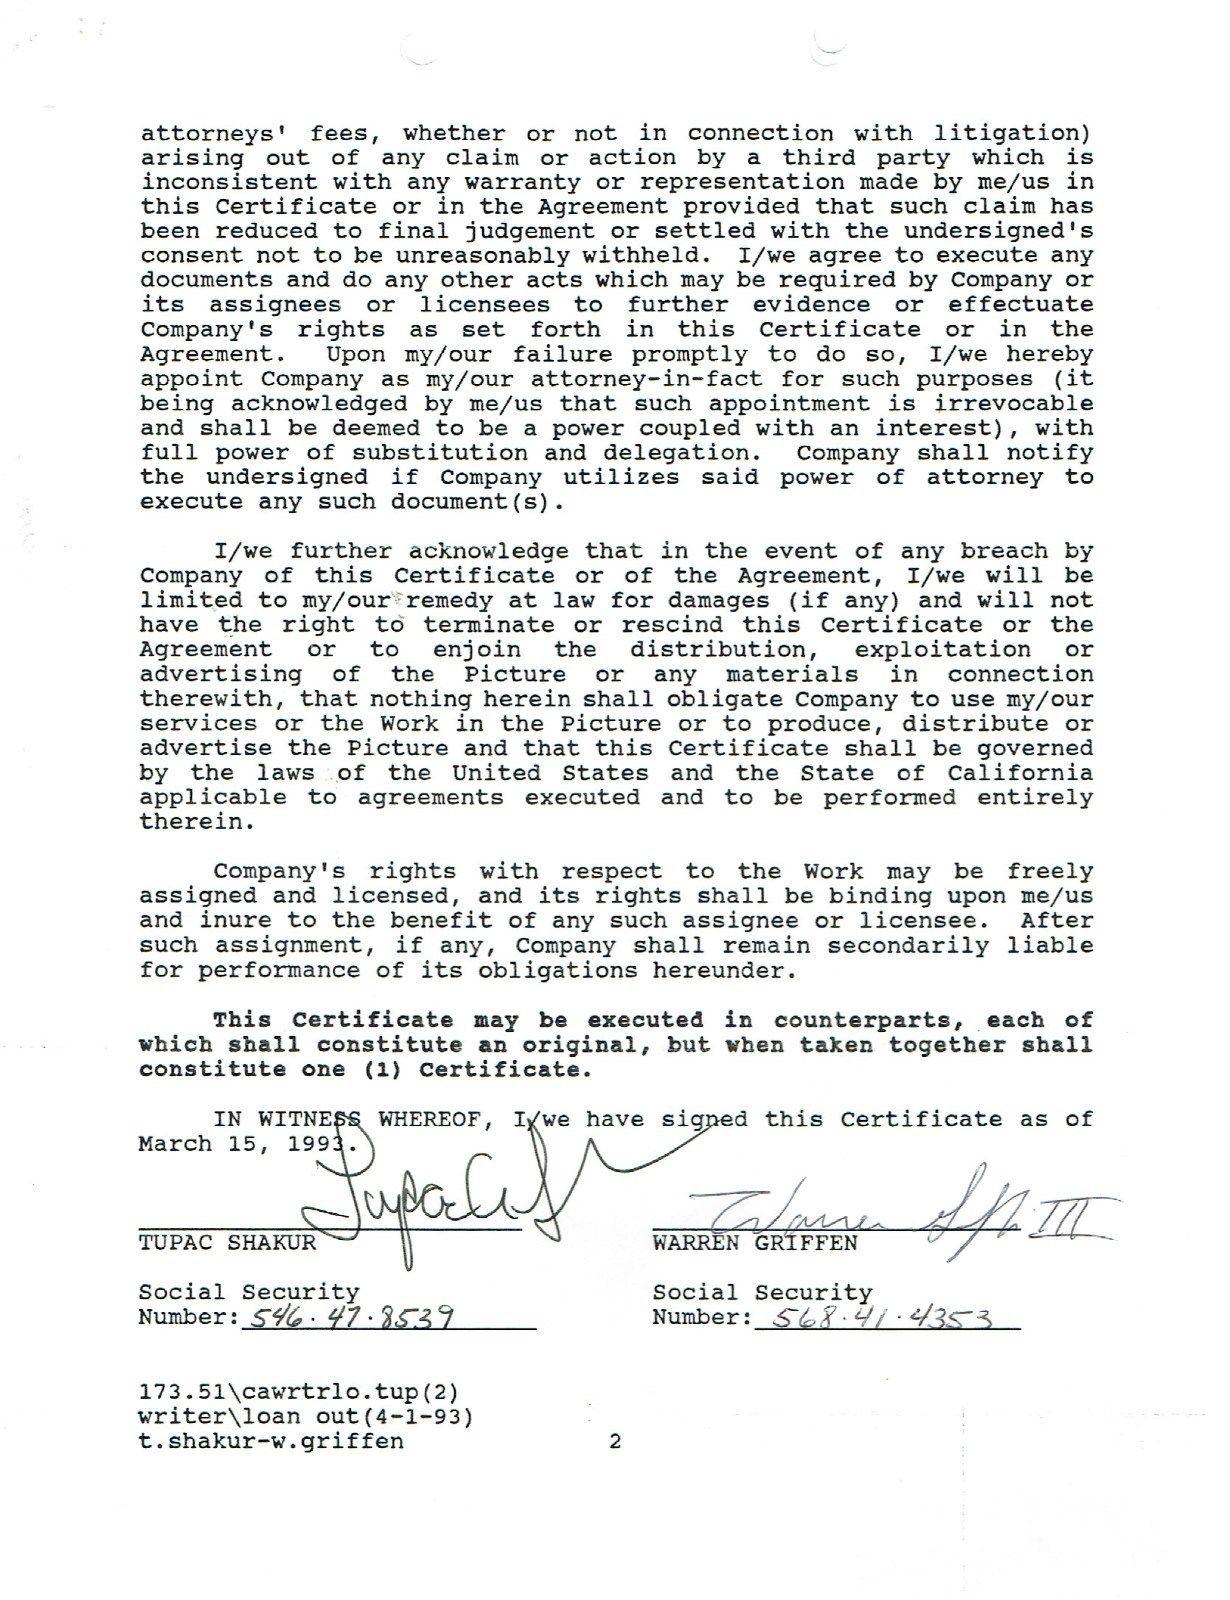 signedcontract2pac1